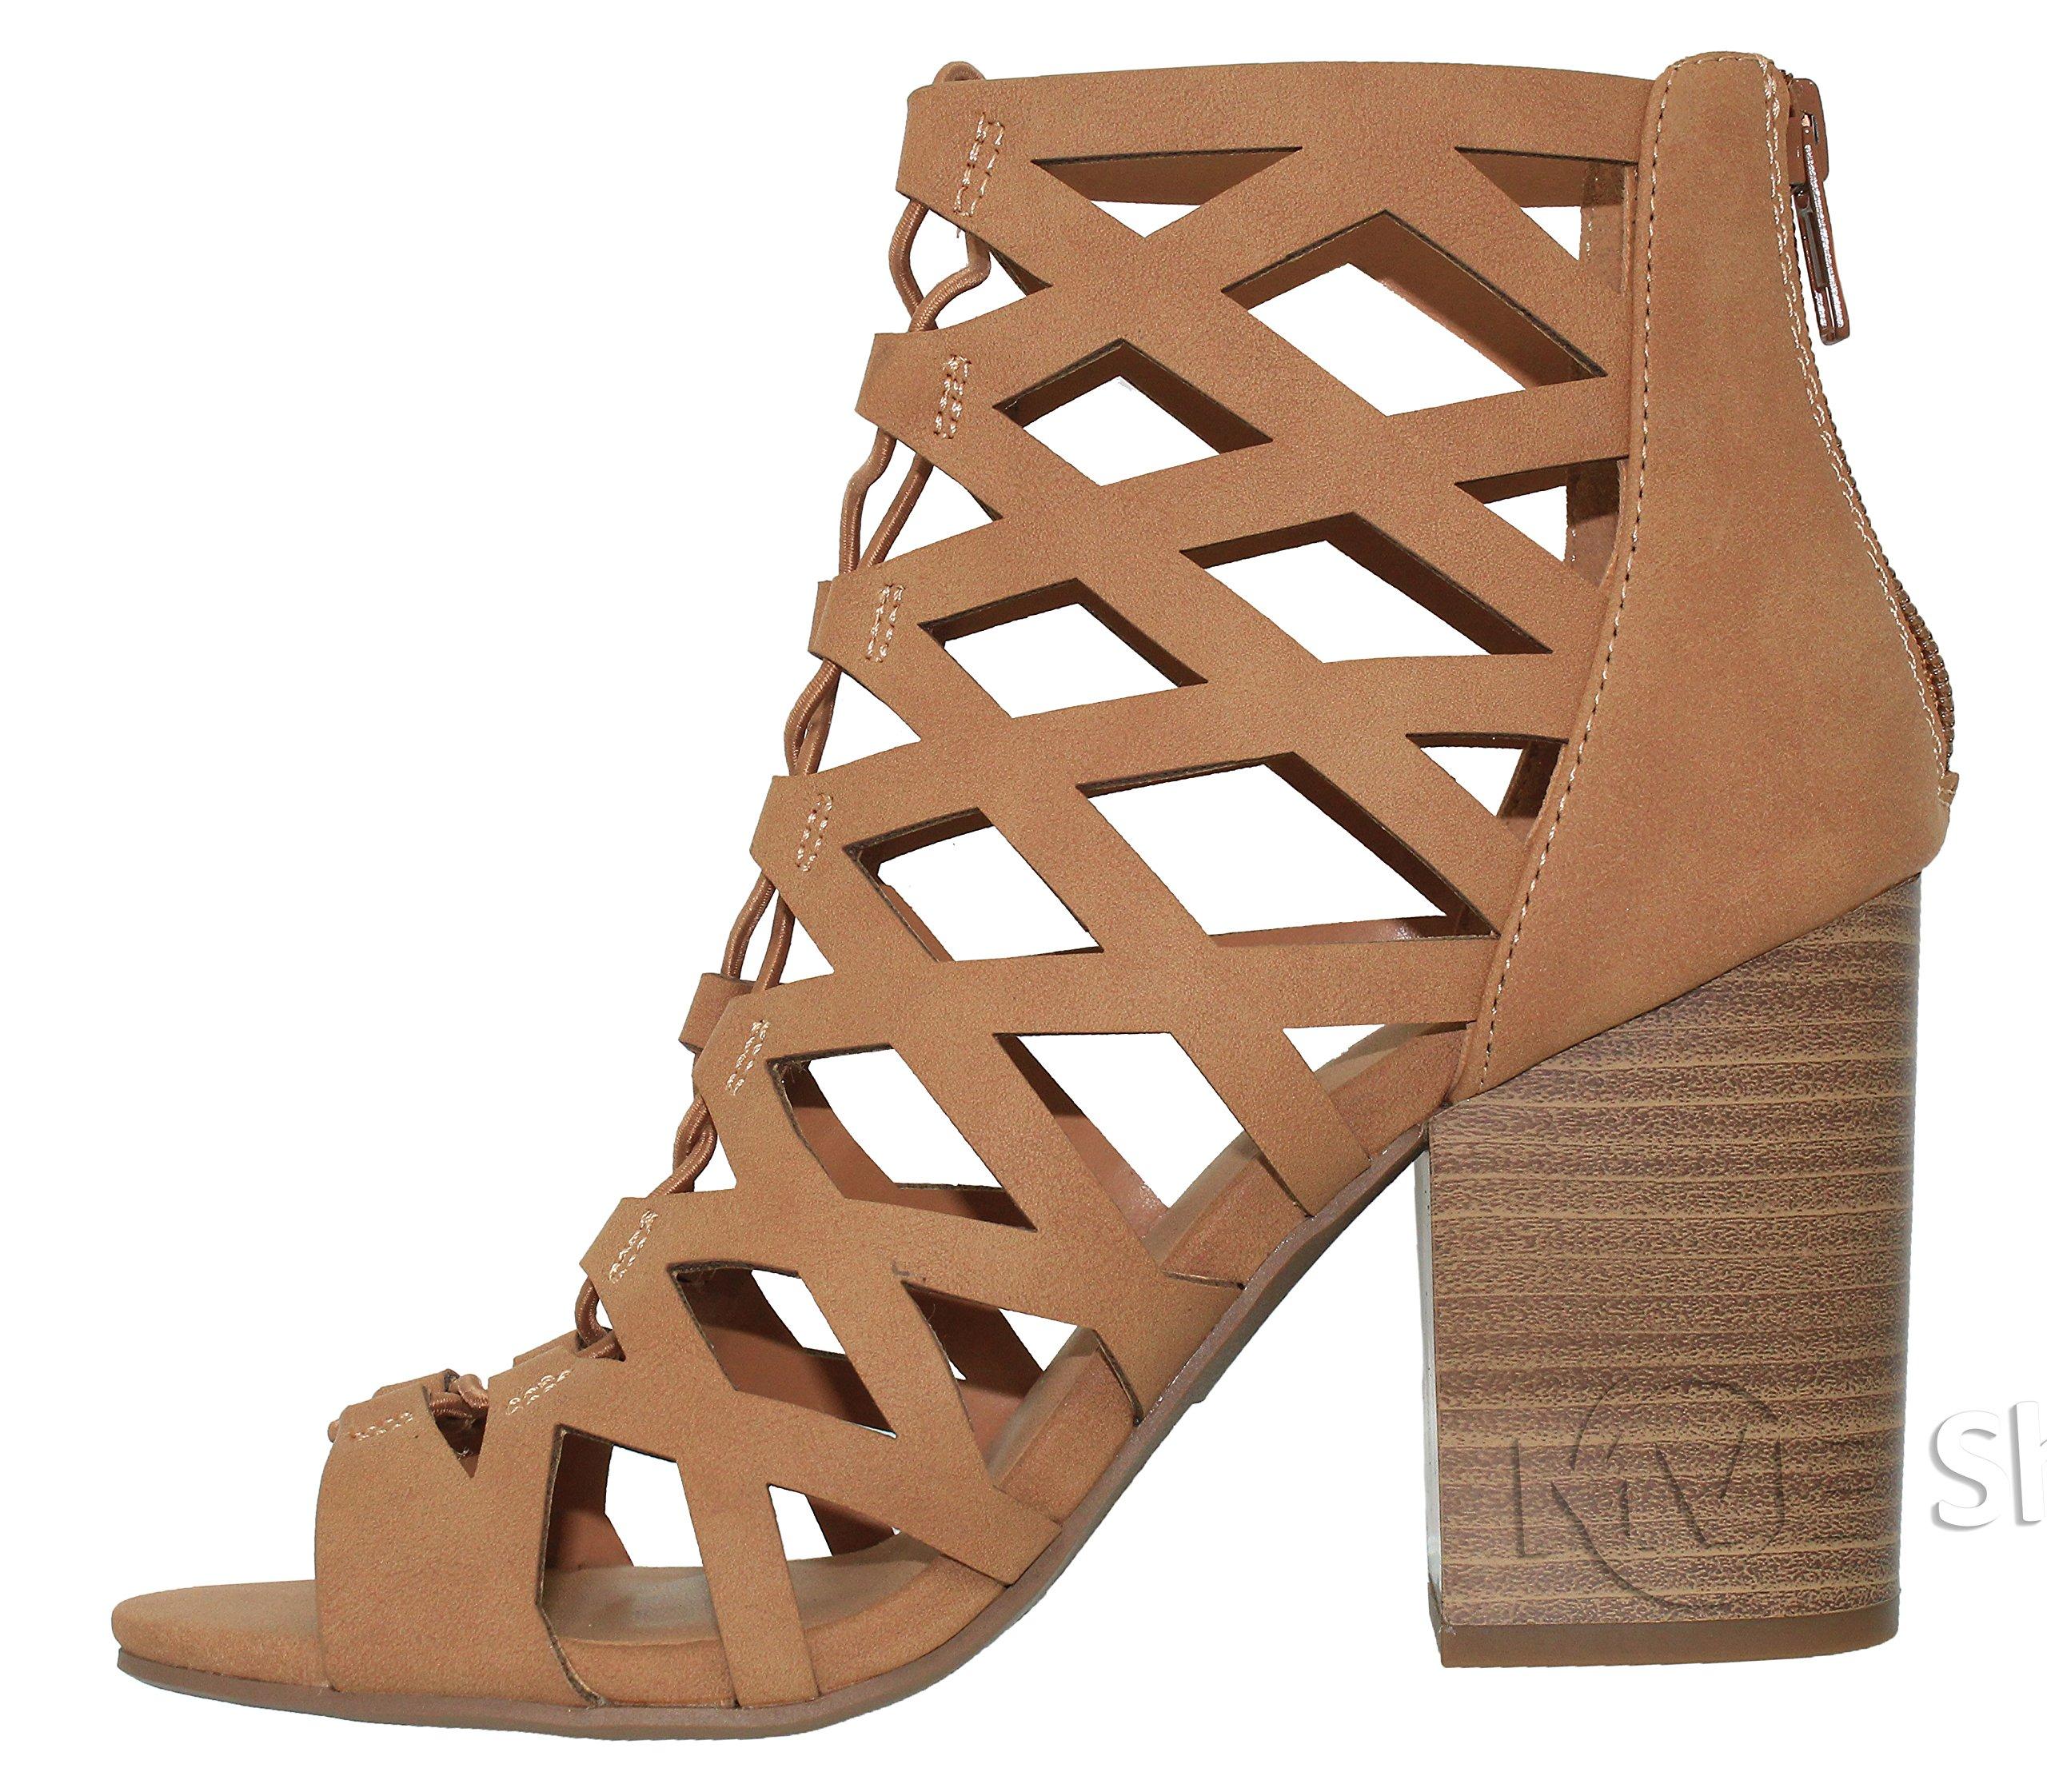 MVE Shoes Women's Open Toe Strappy Back Zipper Chunky Heel, tan nb Size 10 by MVE Shoes (Image #3)